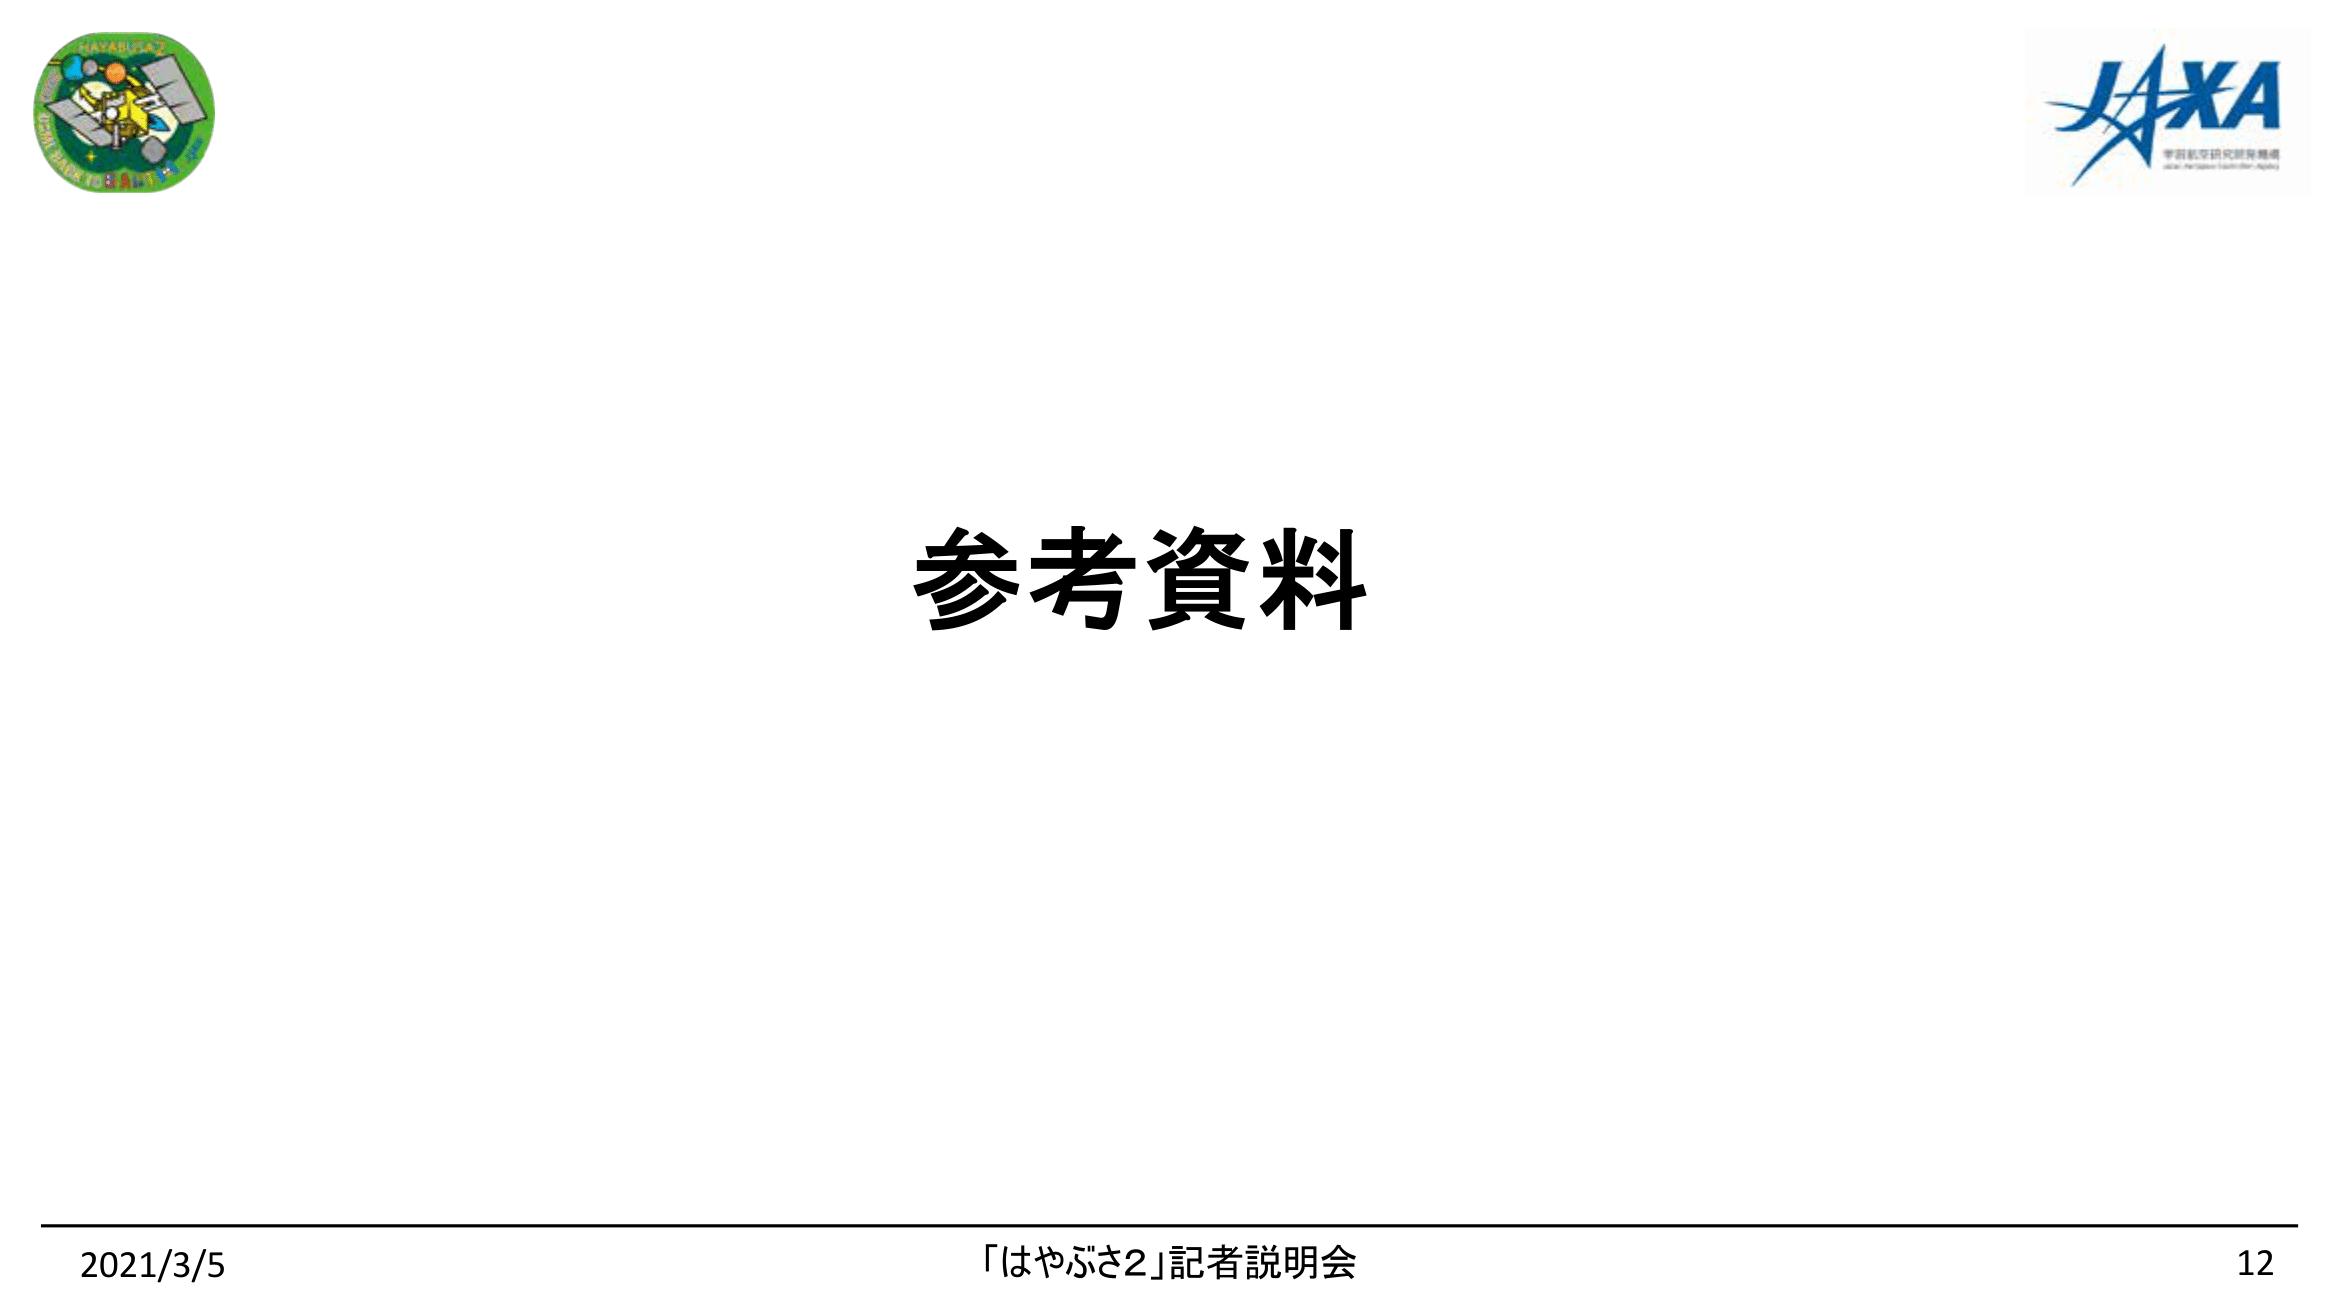 f:id:Imamura:20210305134212p:plain